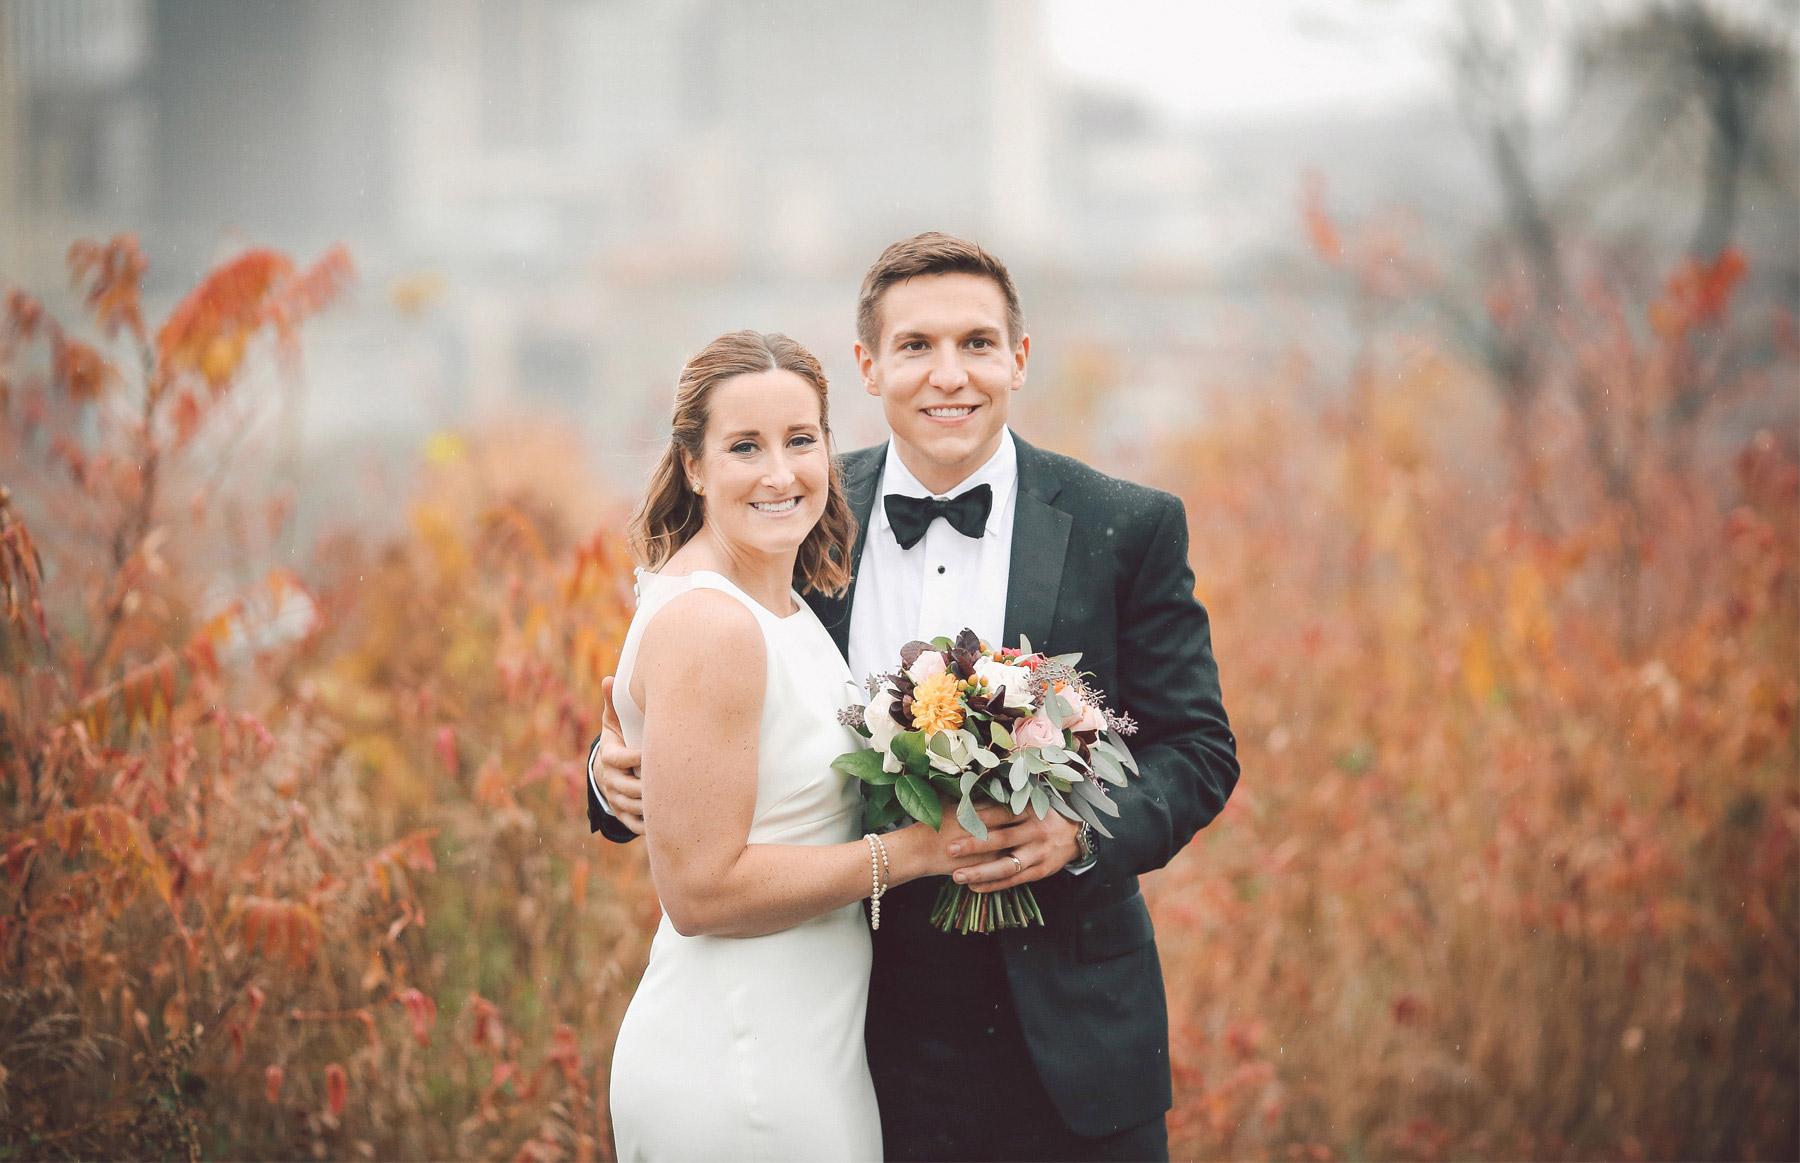 14-Saint-Paul-Minnesota-Wedding-Photographer-by-Andrew-Vick-Photography-Fall-Autumn-Bride-Groom-Flowers-Rain-Vintage-Kathryn-and-Sam.jpg